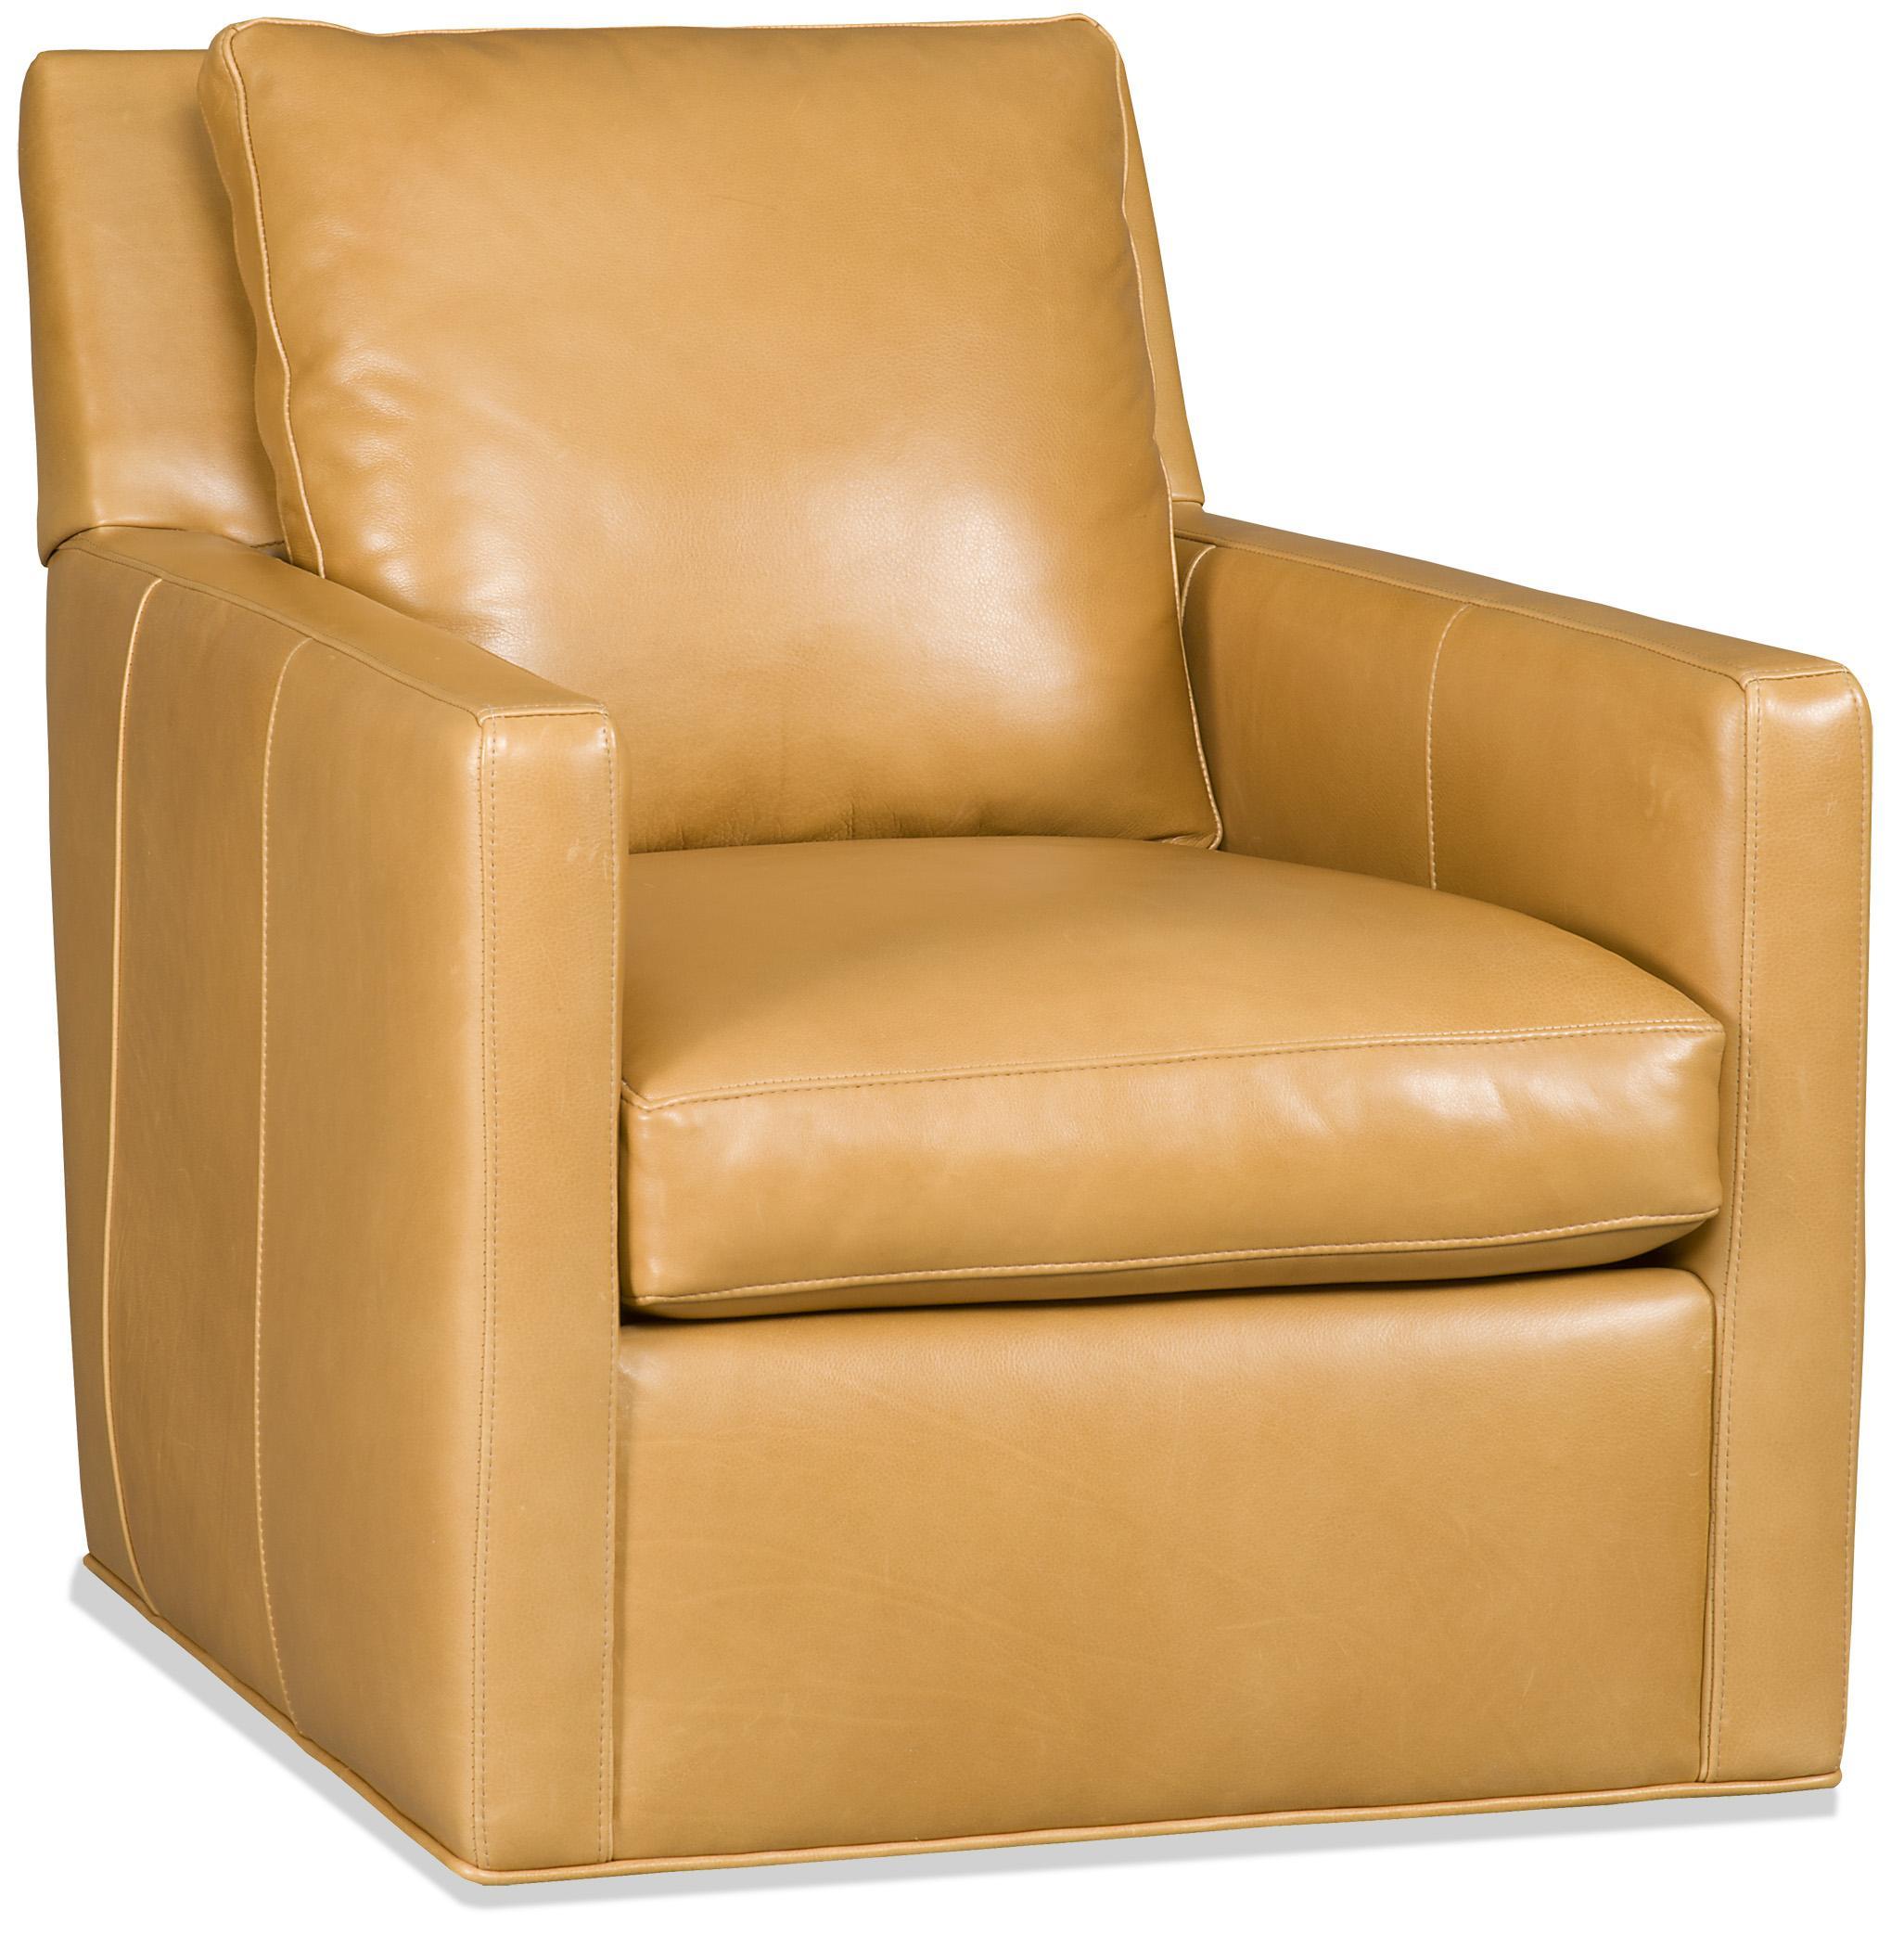 Bradington Young Swivel Tub Chairs Jaxton Swivel Tub Chair